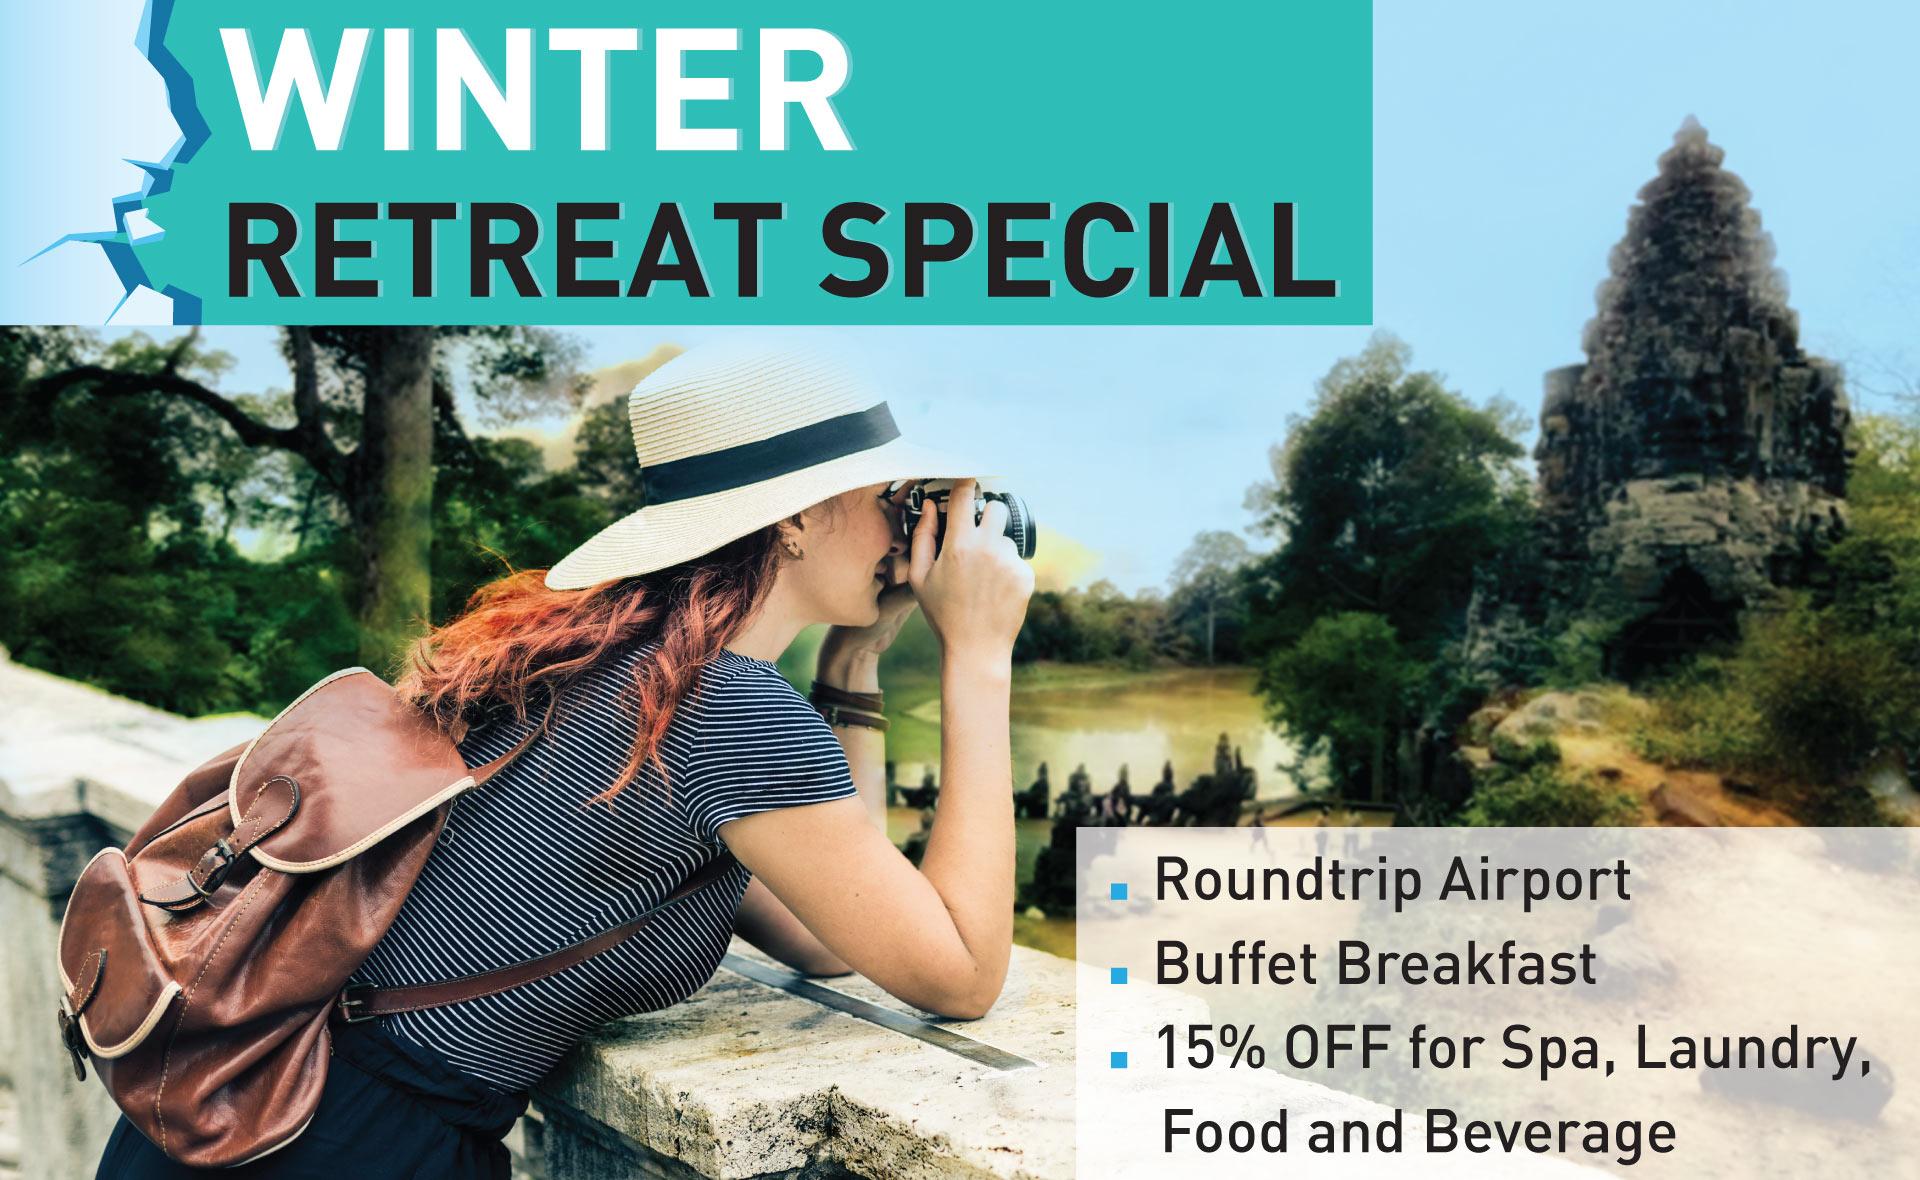 Winter Retreat Special